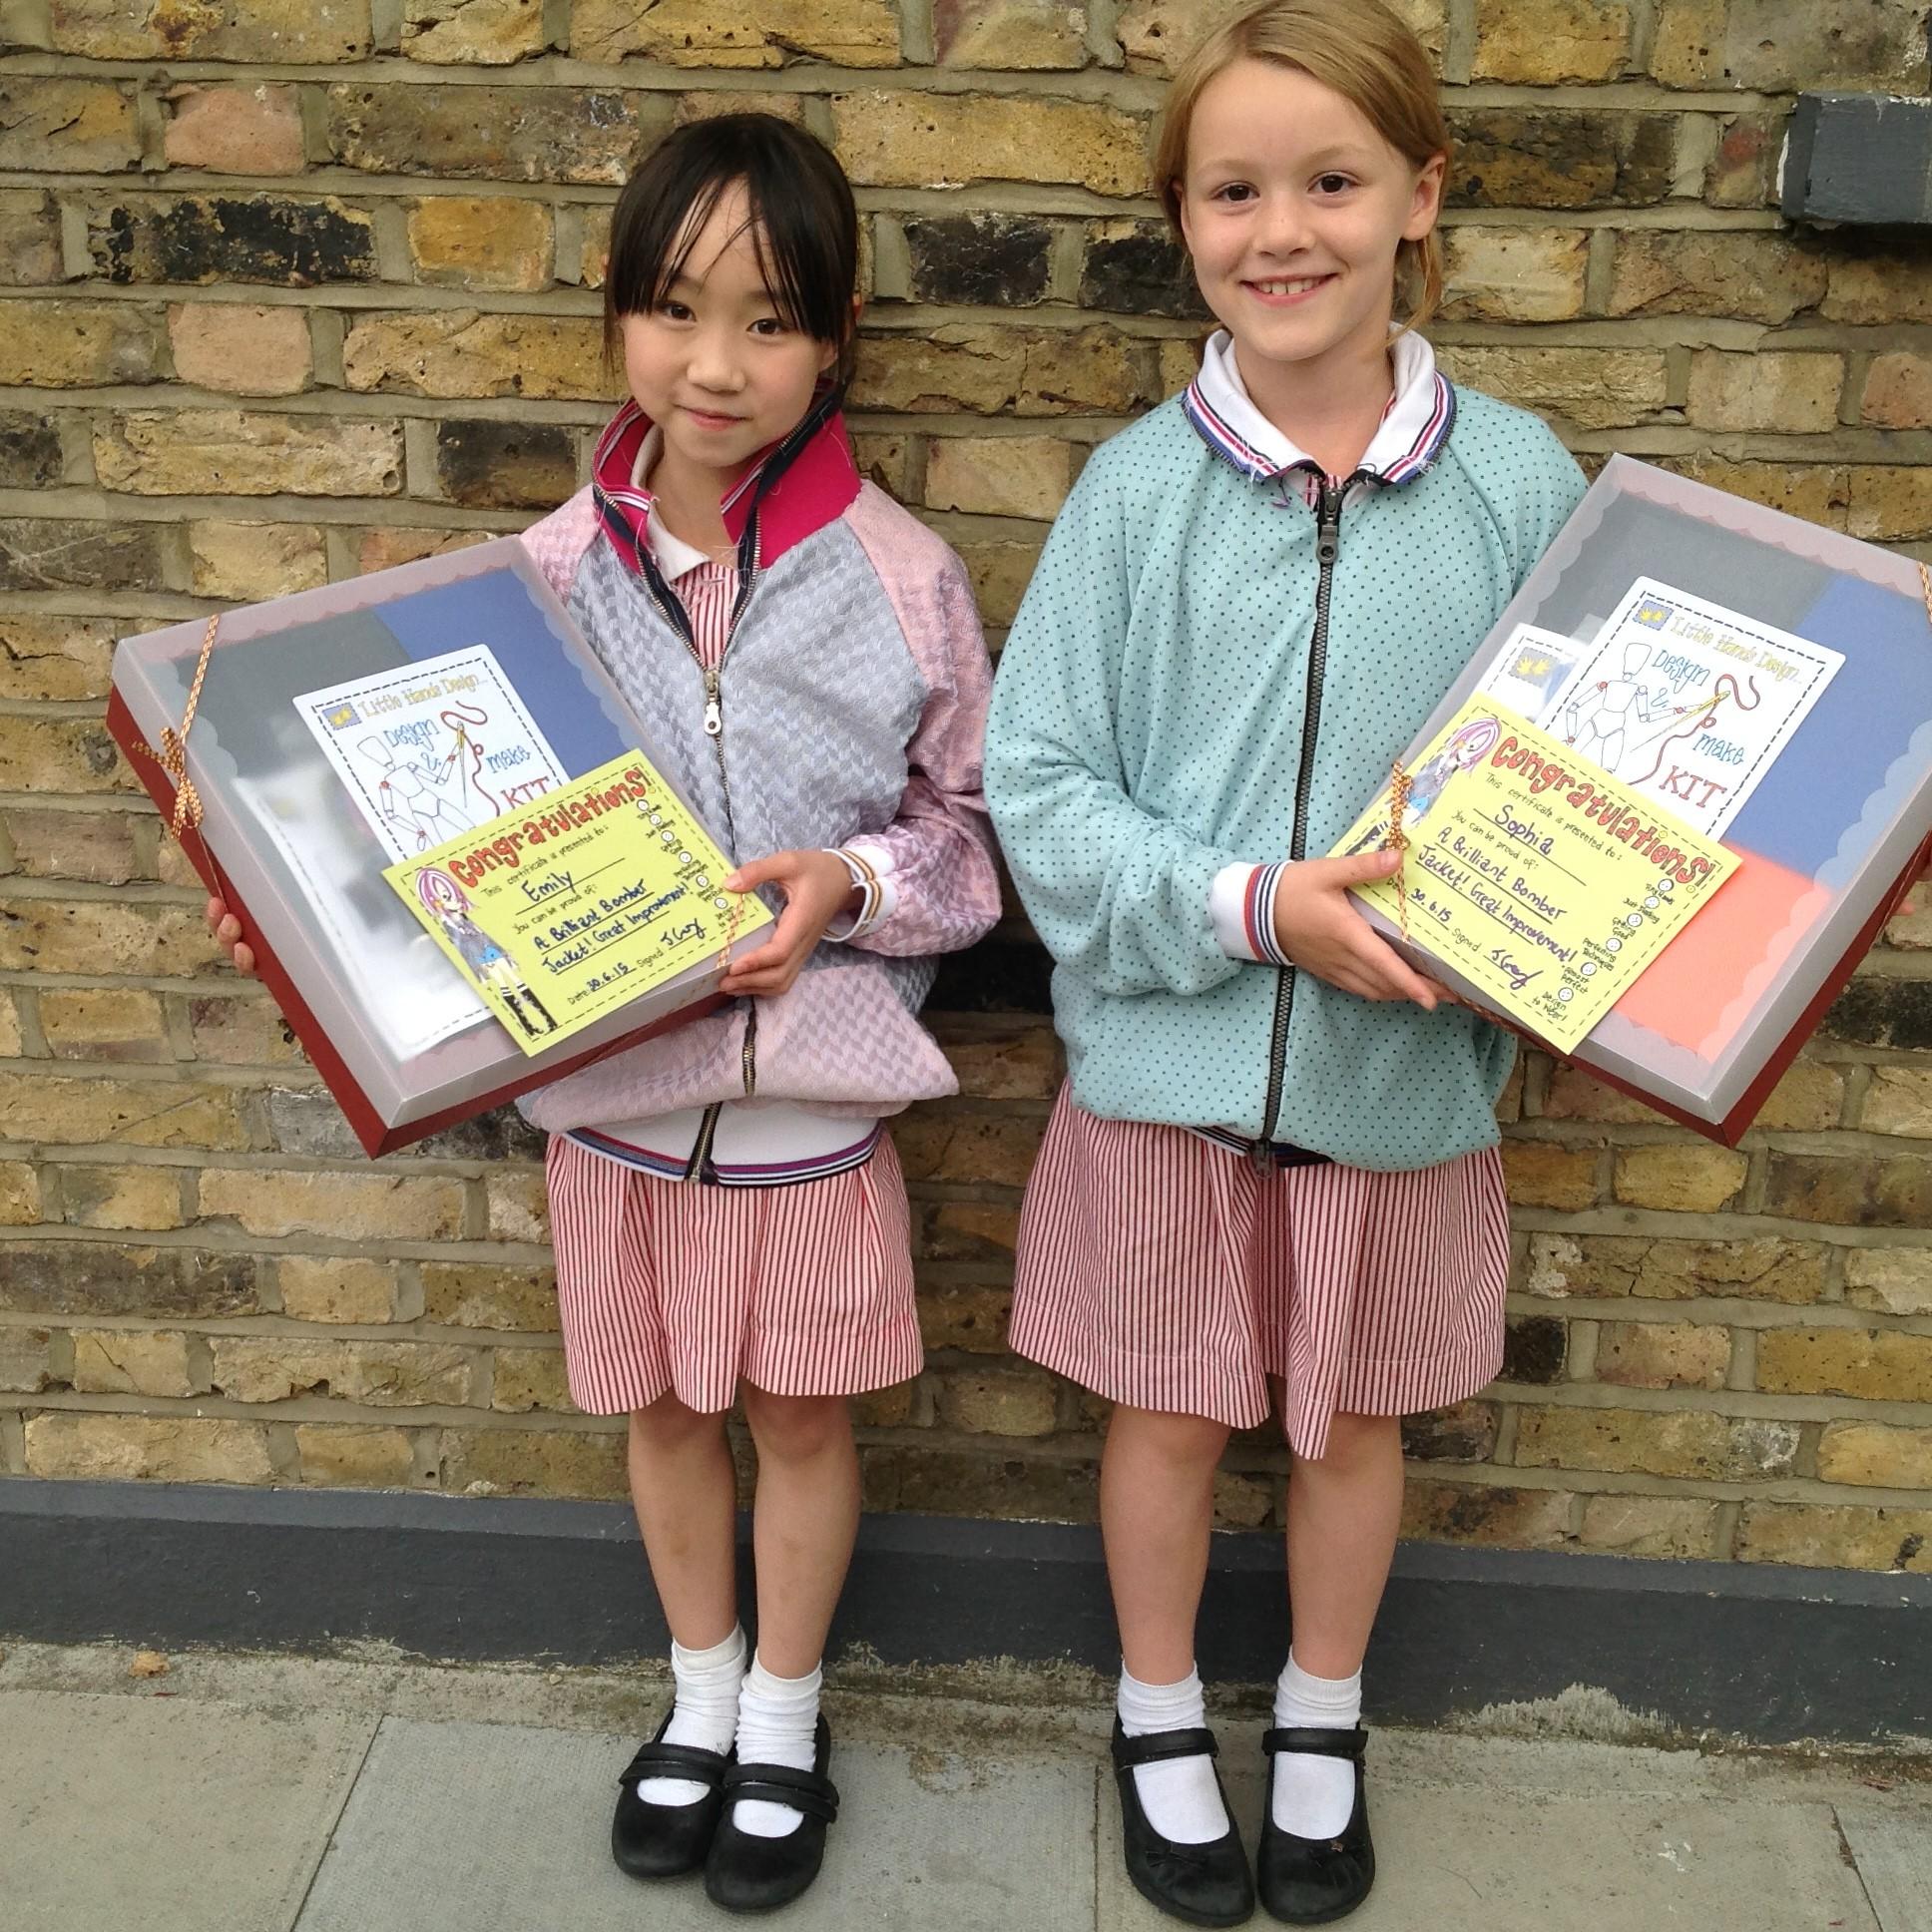 Summer Term 2015 Prize Winners!